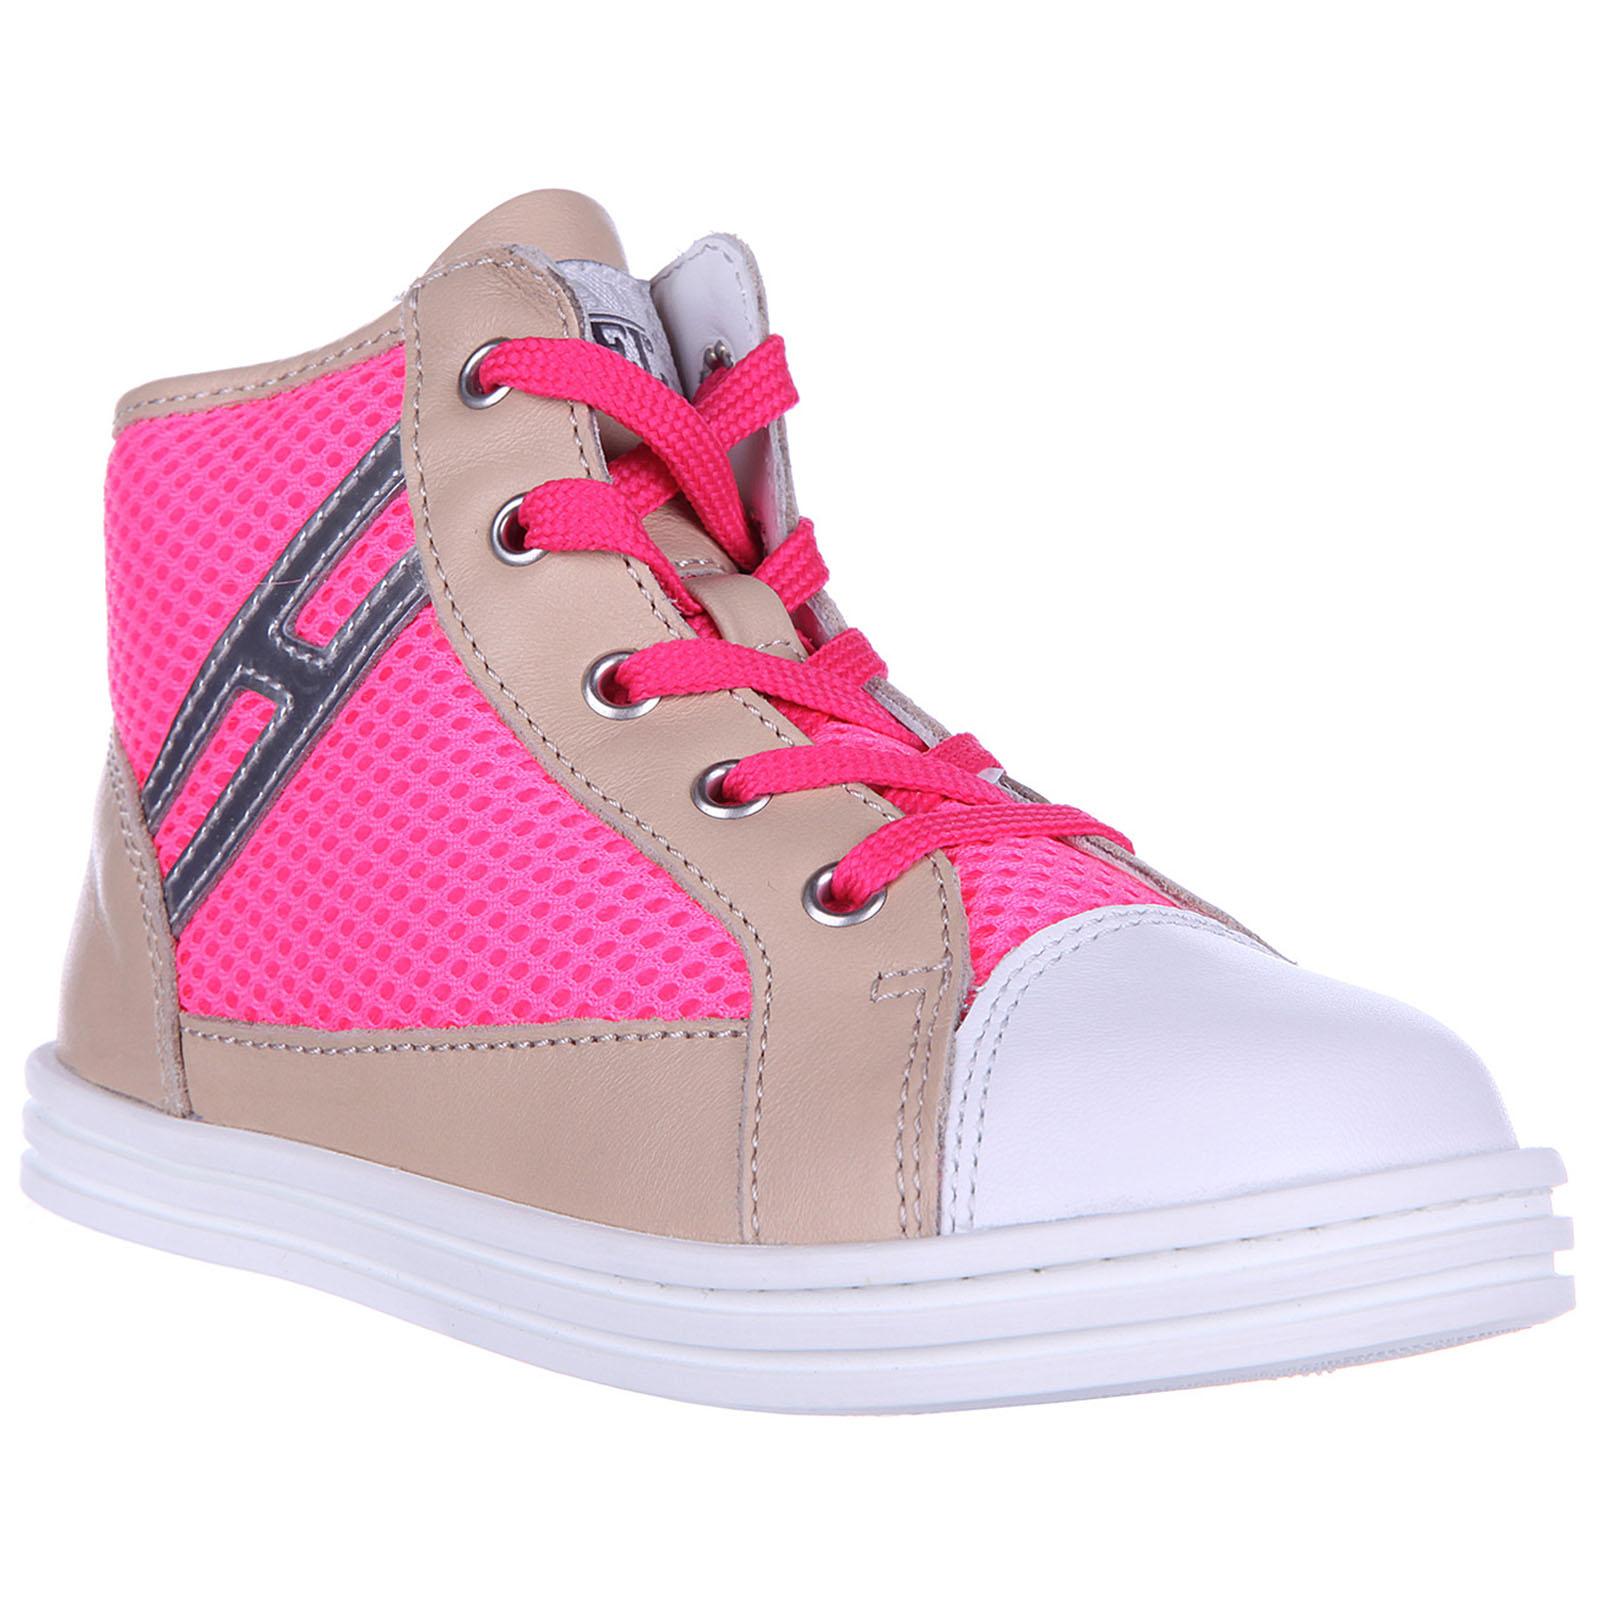 558d5c063c264 ... Scarpe sneakers bimba bambina alte pelle rebel r141 ...